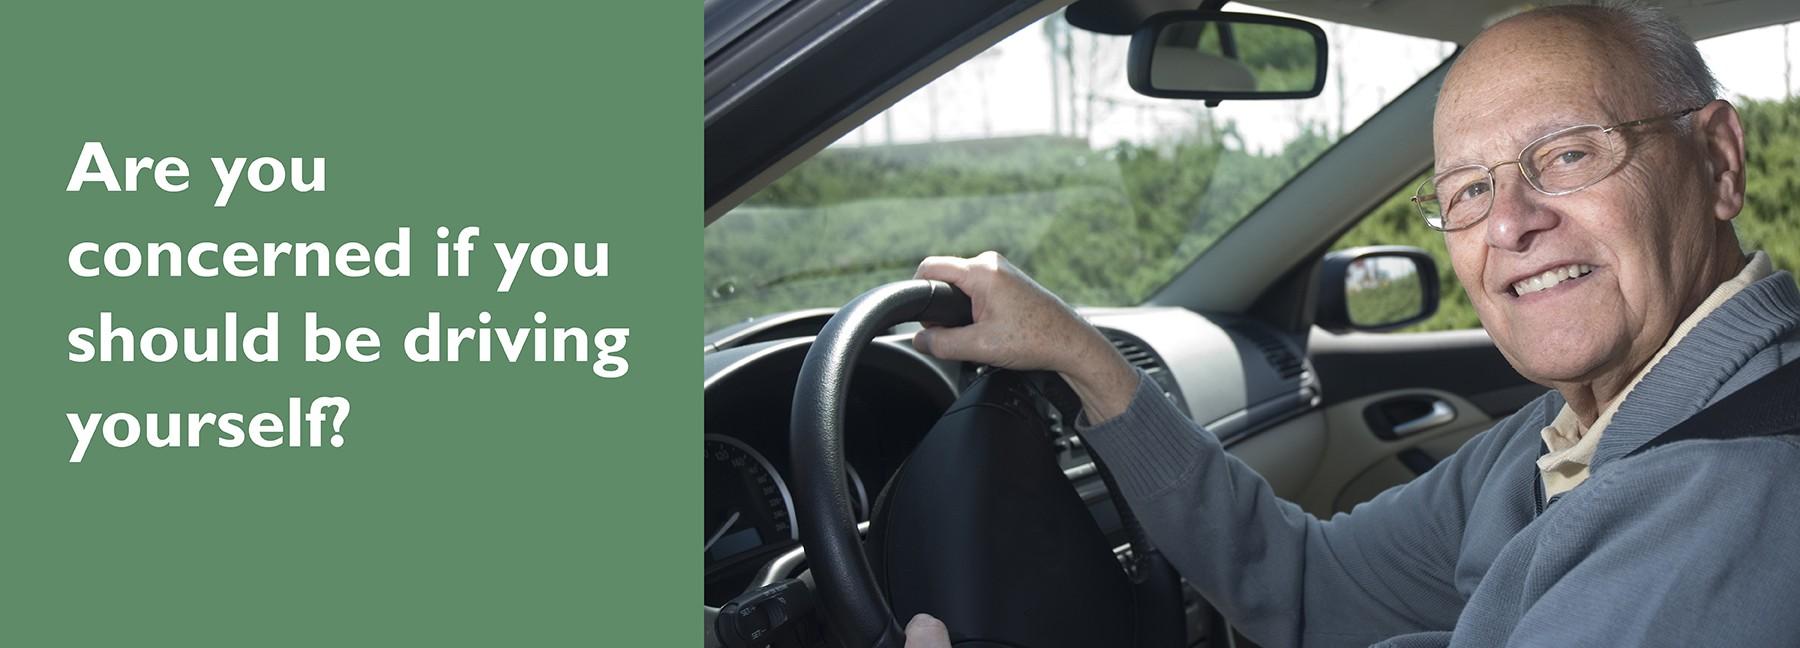 Driving Assessments Banner_1800x648.jpg